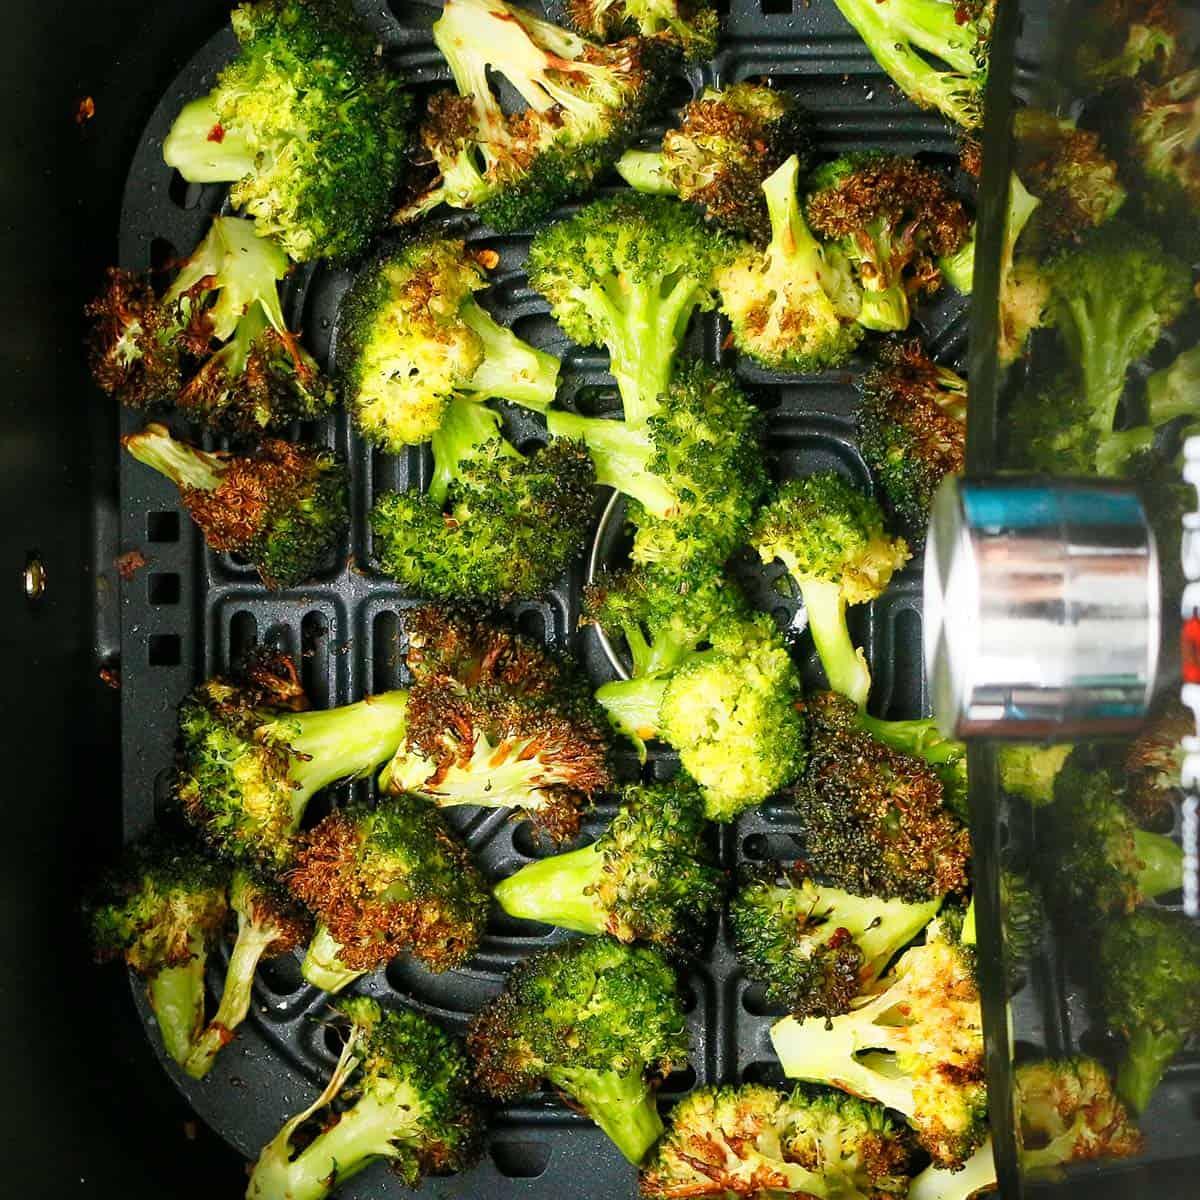 hot crispy air fried broccoli in an air fryer